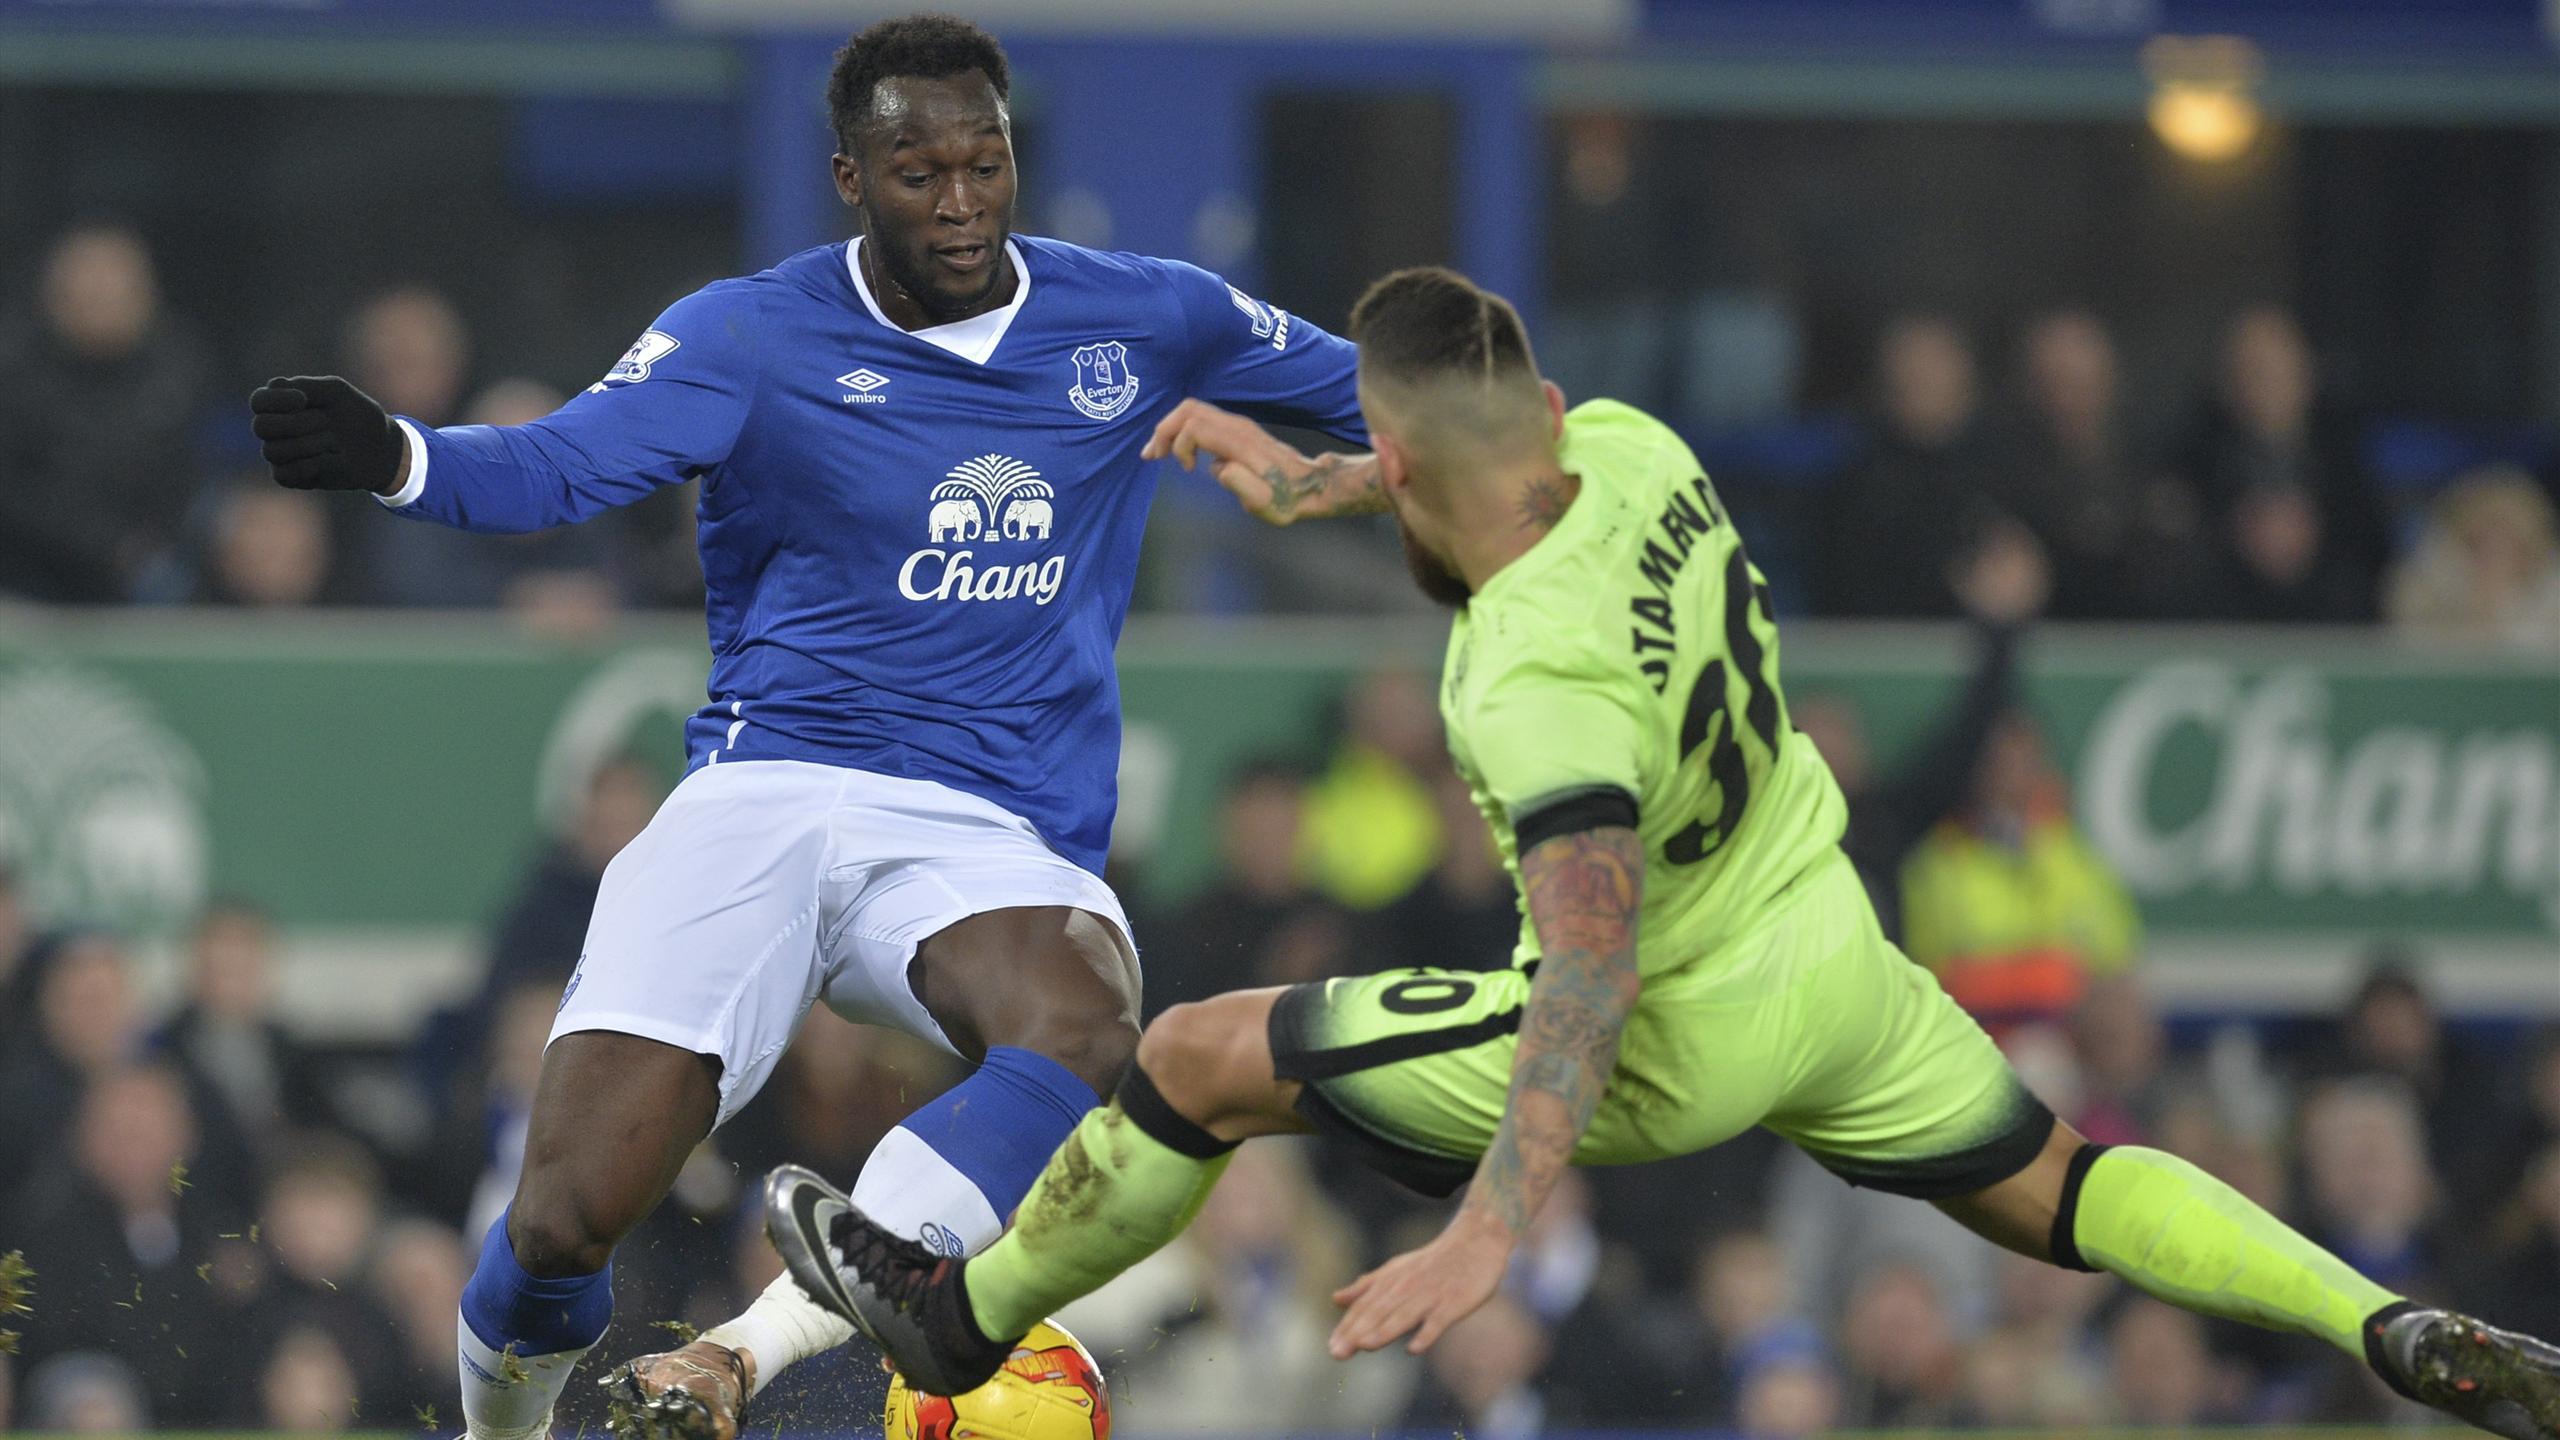 Romelu Lukaku (Everton) face à Nicolas Otamendi (Manchester City), mercredi 6 janvier 2016 en demi-finale aller de la League Cup